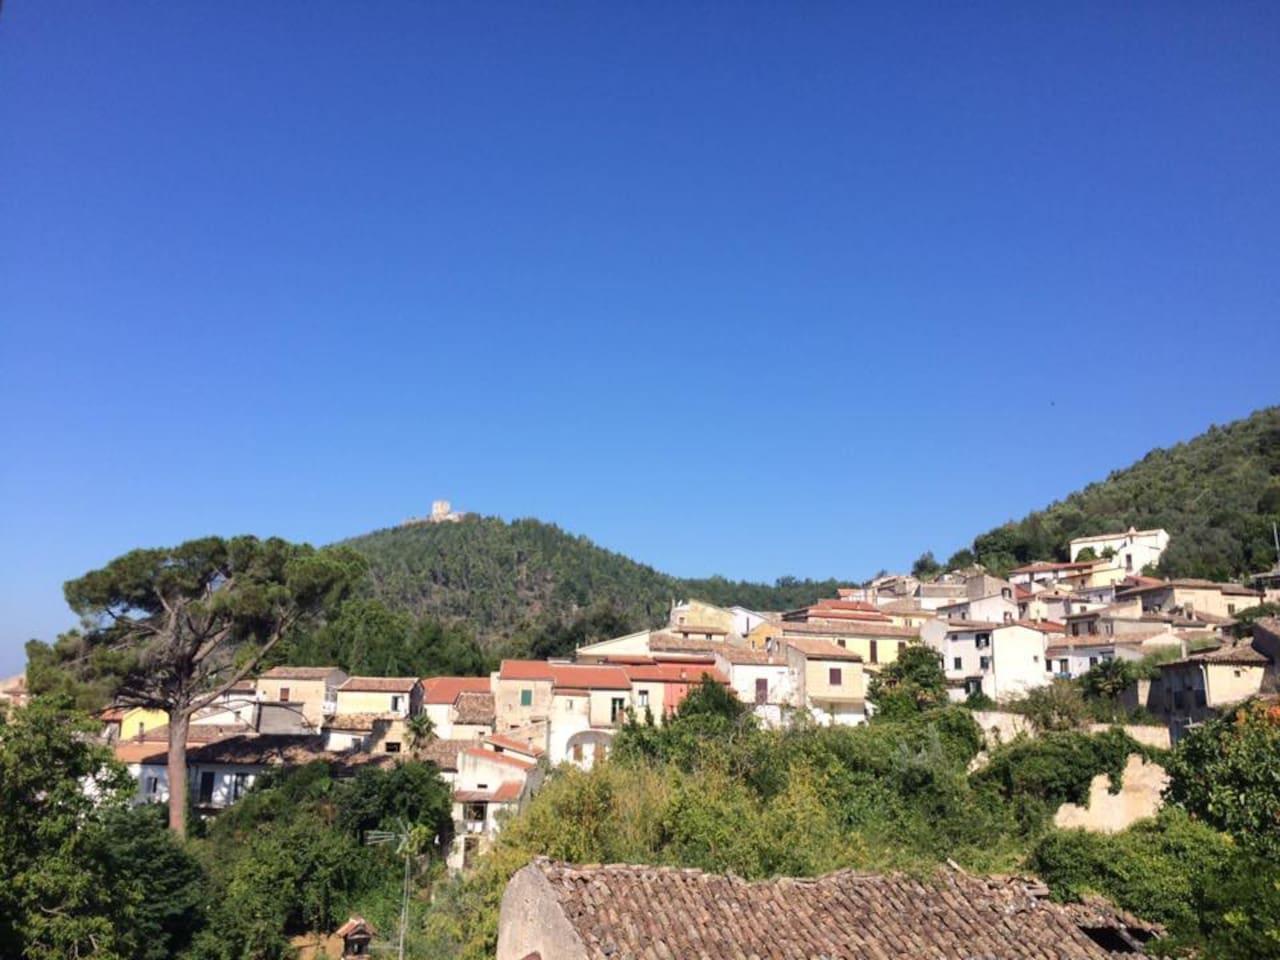 Veduta del Castello di Sant'angelo d'Alife dal B&b